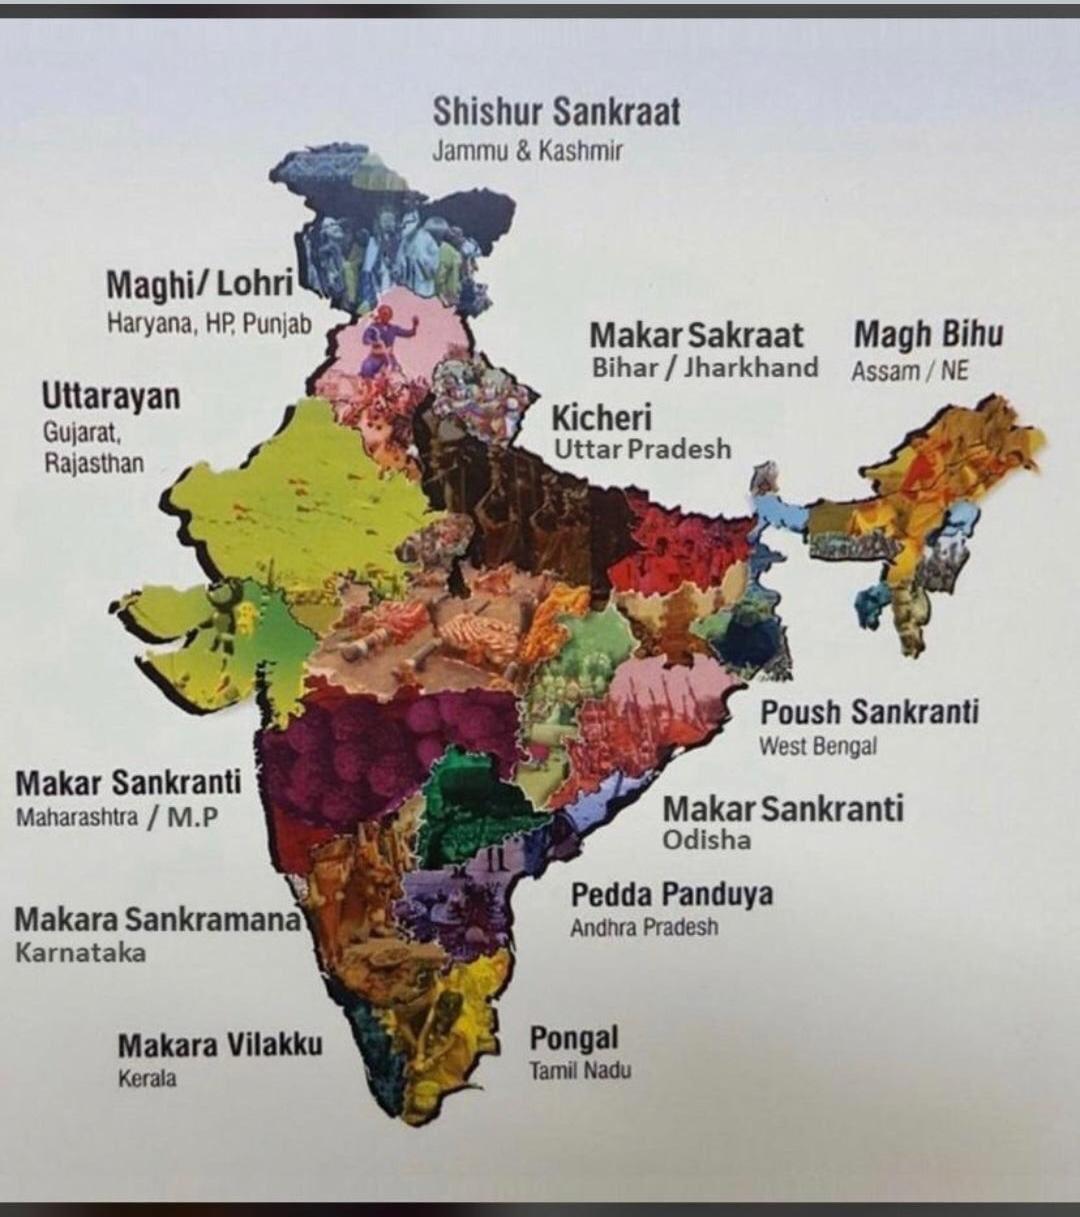 Shishur-Sankraat